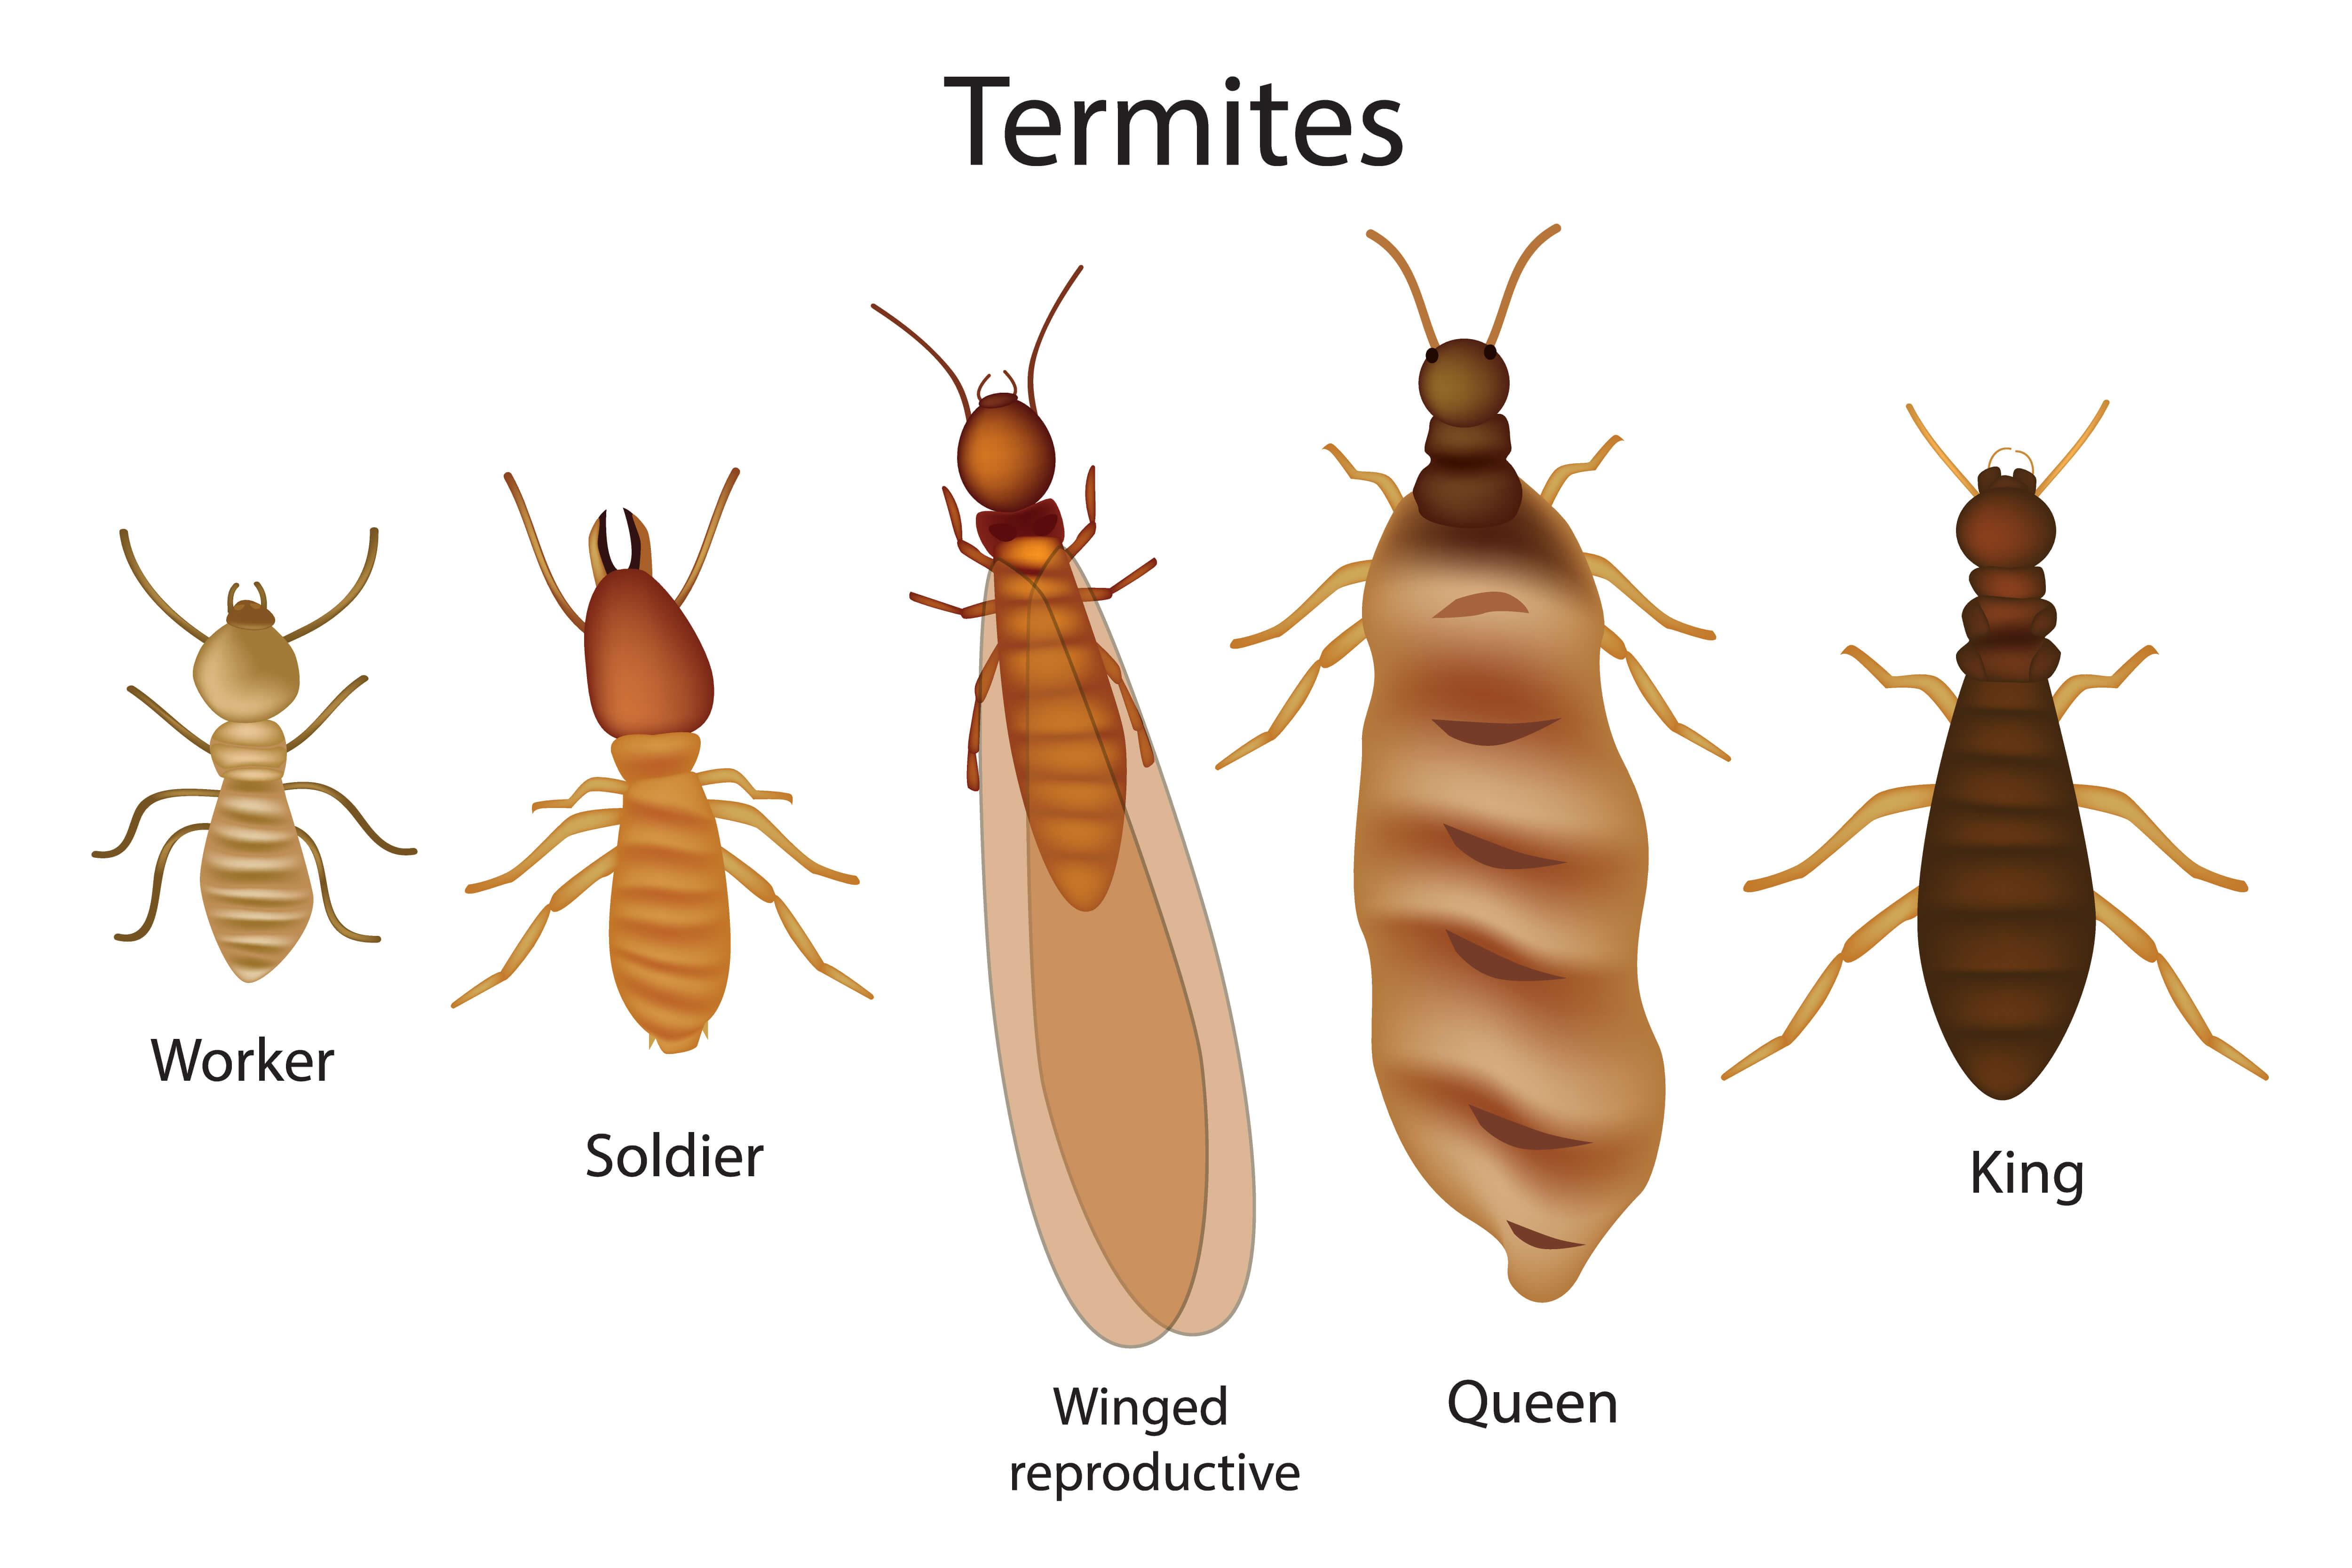 La termita es un xilófago tozudo.